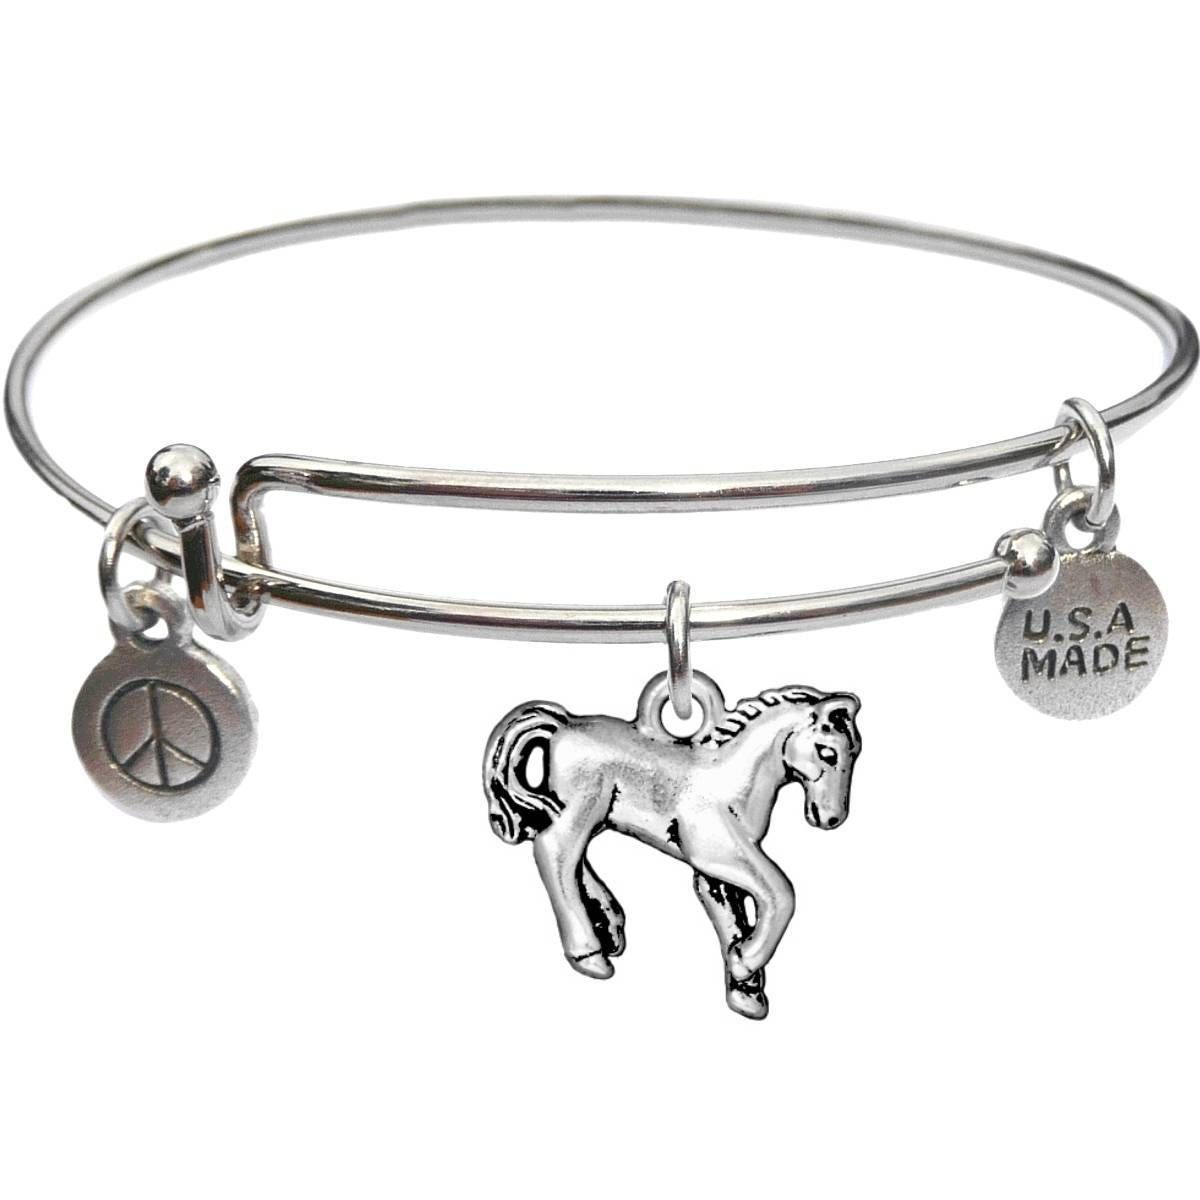 Bangle Bracelet and Horse - USA Made - BBandJT151